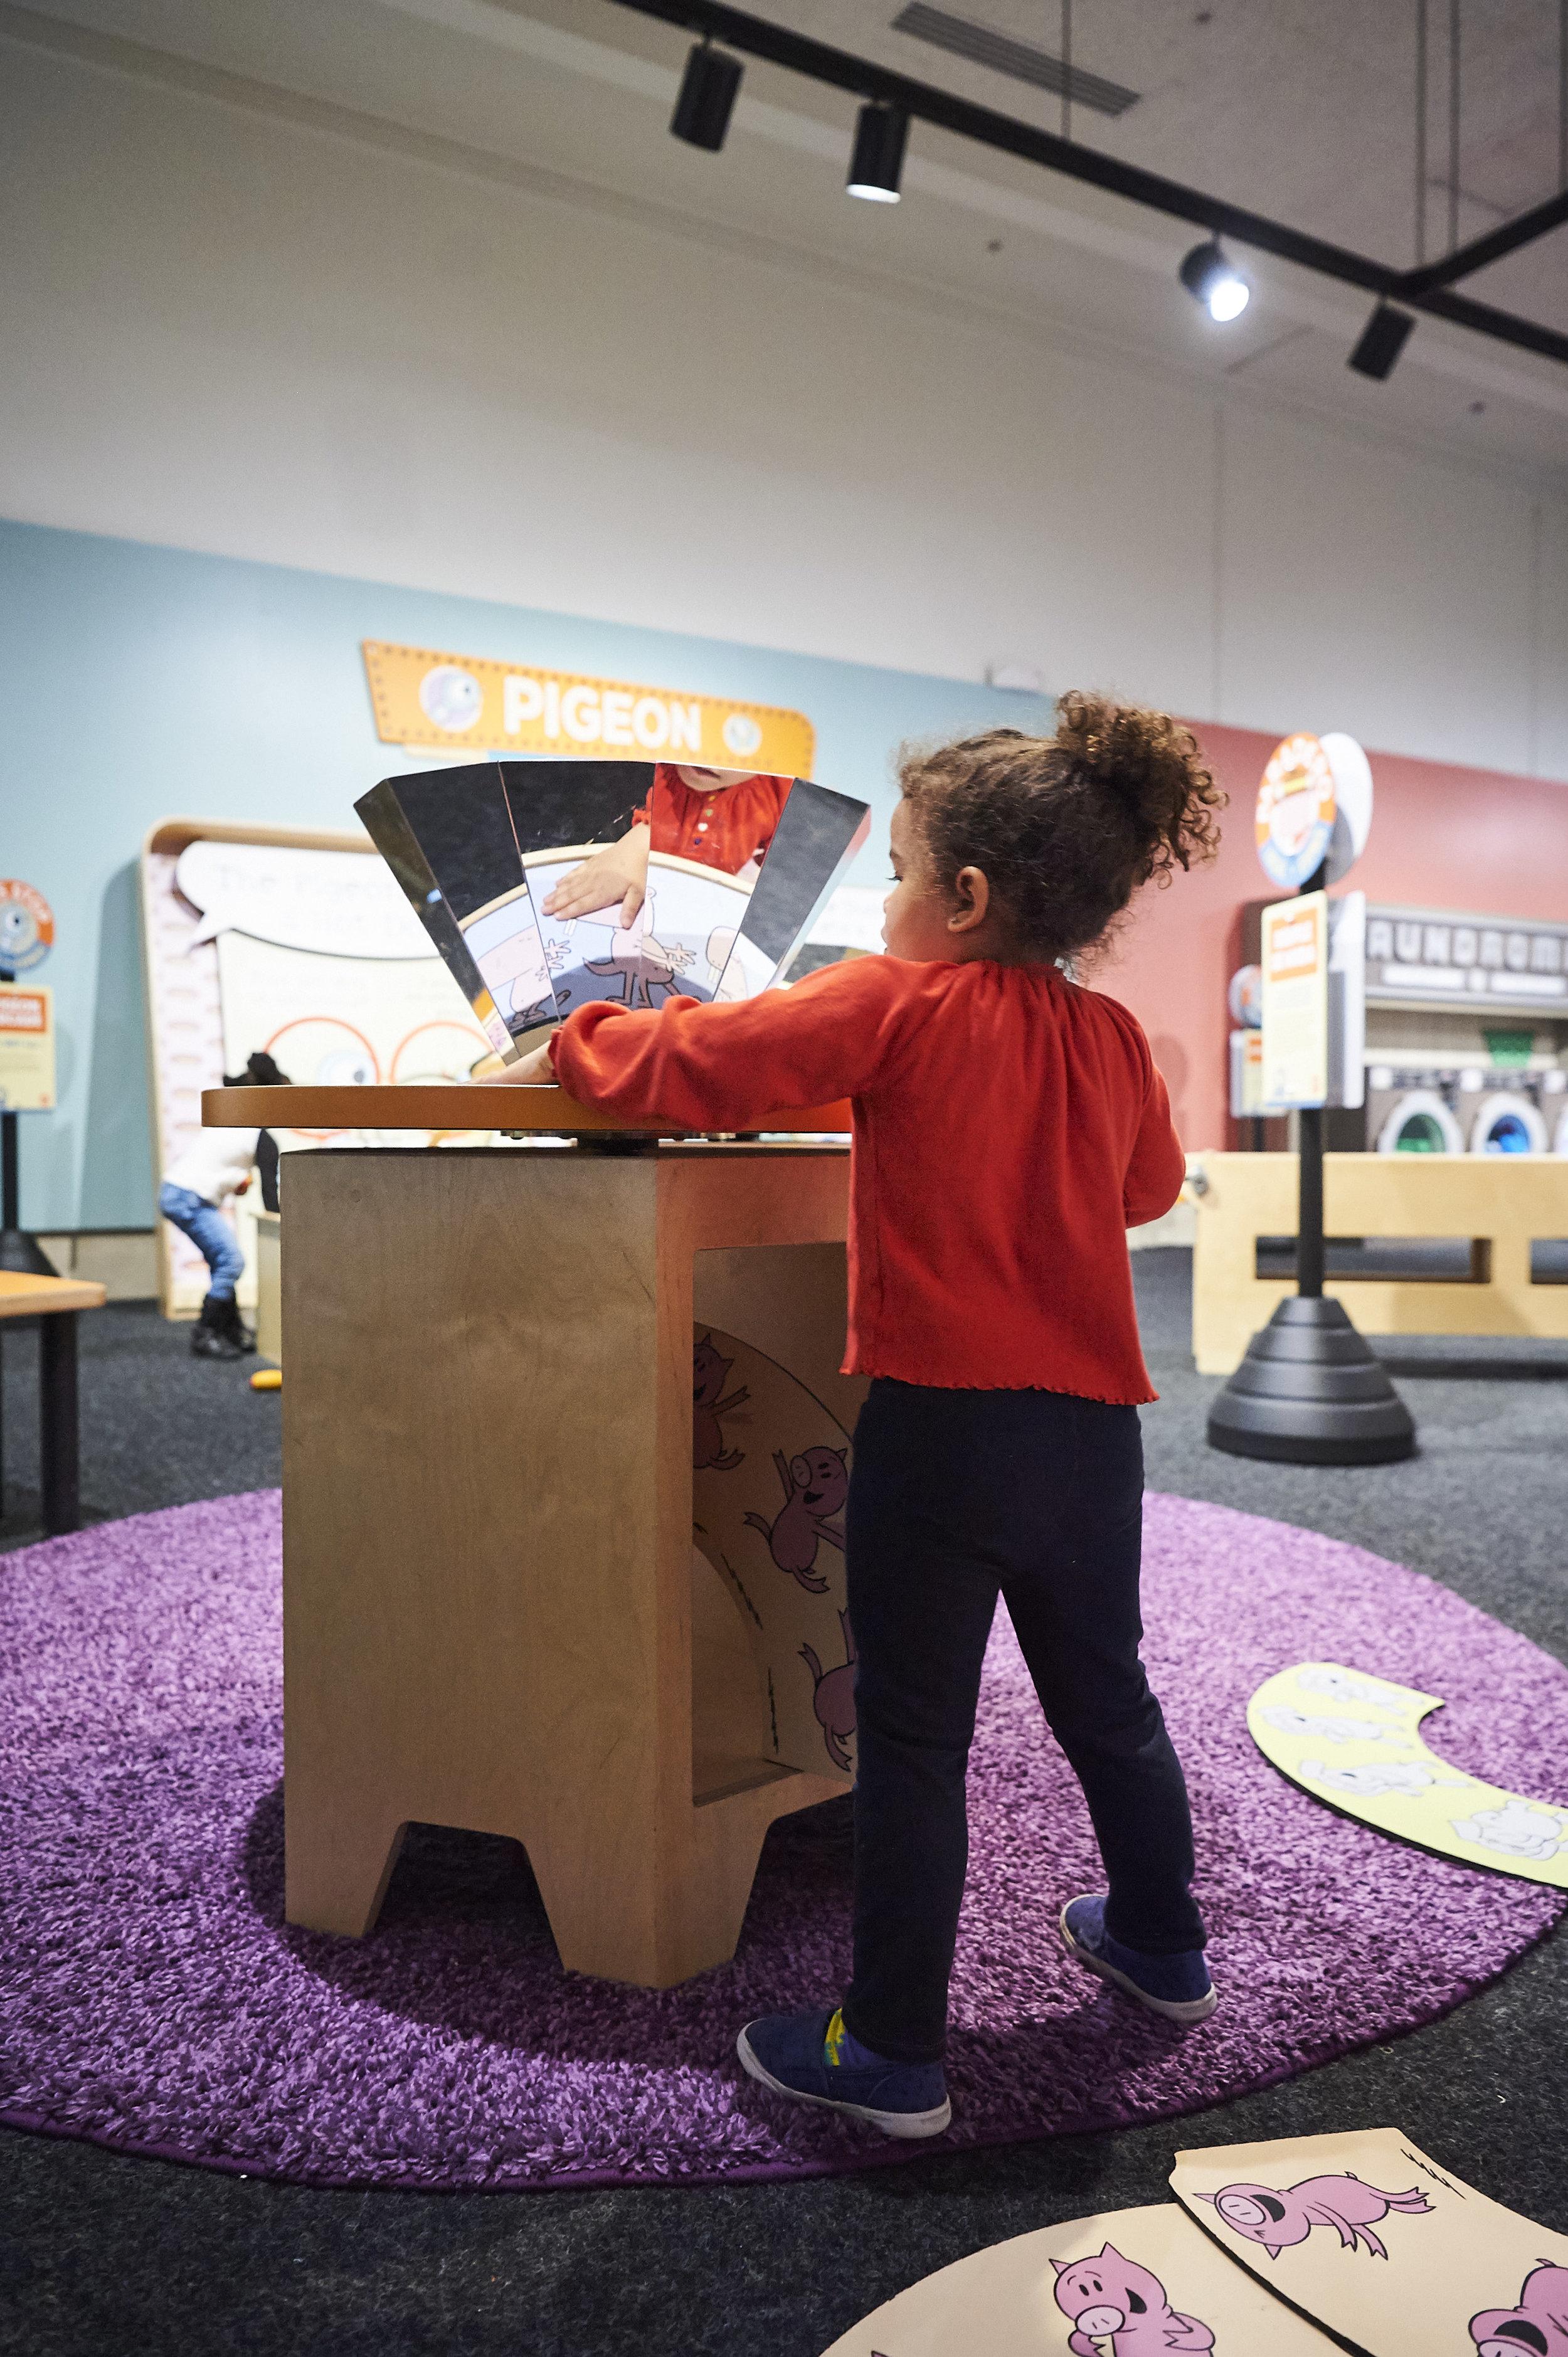 180425_ChildrensMuseum_Pigeon_149.jpg